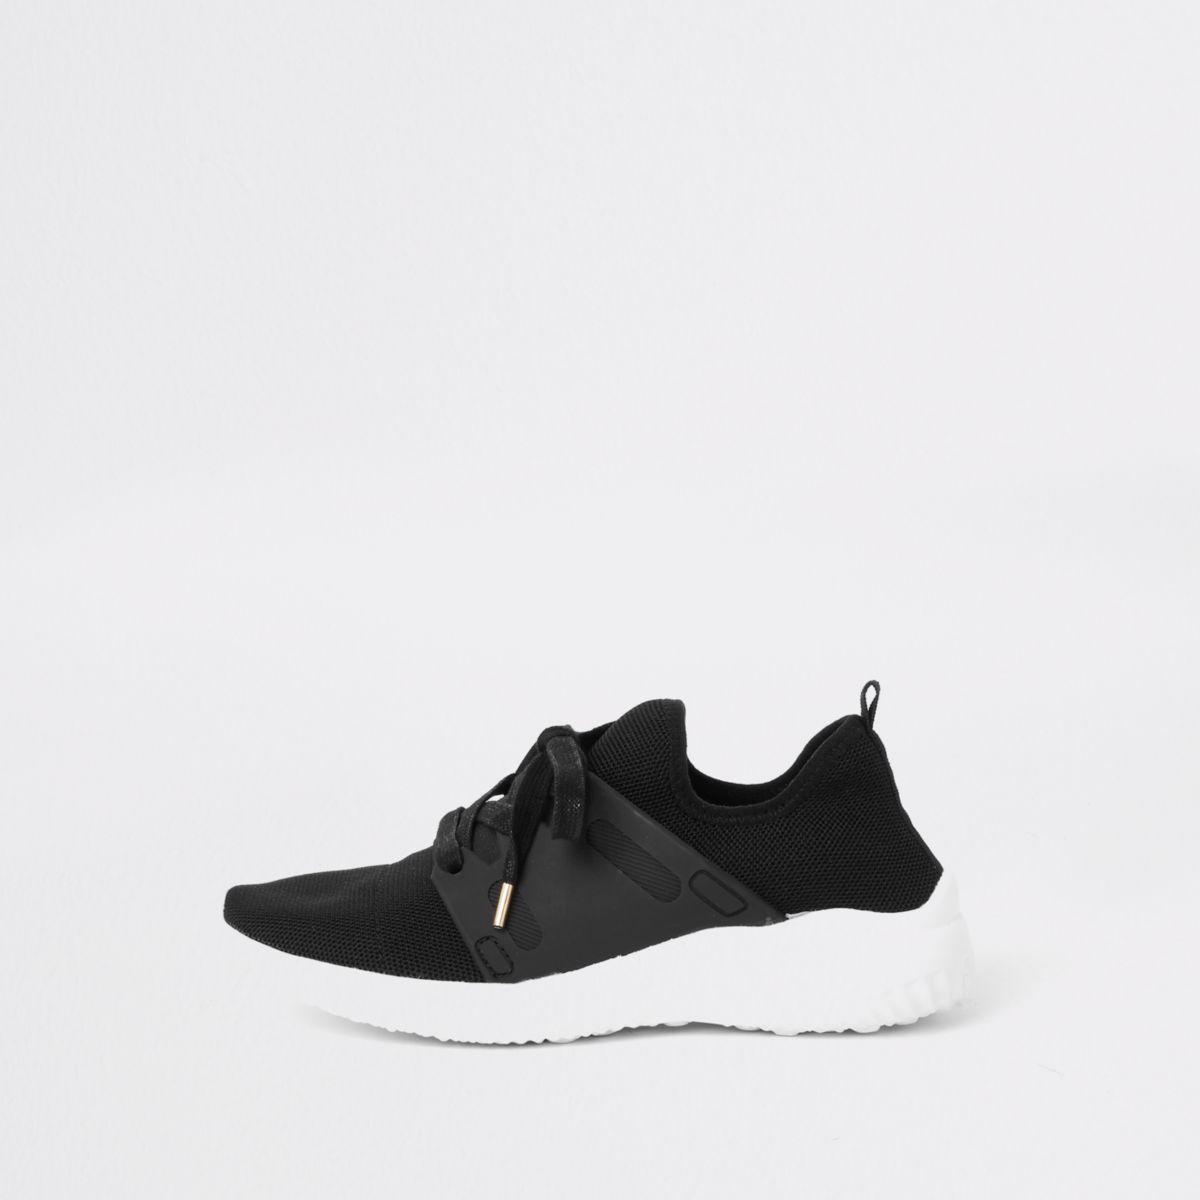 Zwarte gebreide vetersneakers